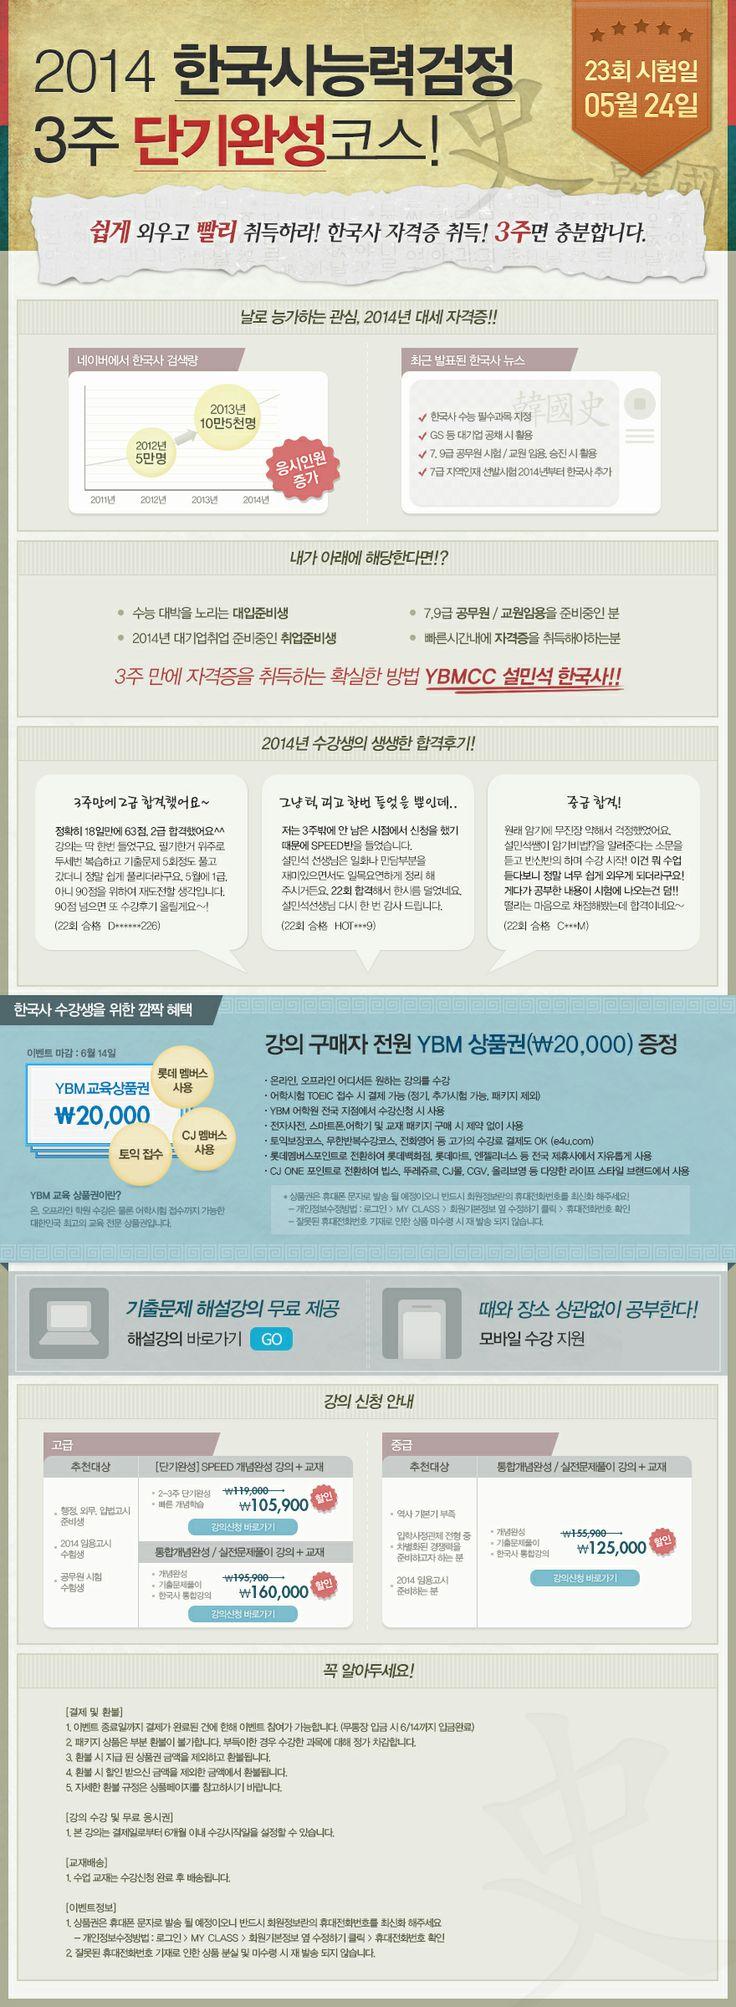 [YBM CC] 2014 한국사능력검정 3주 단기완성코스 (이영실)